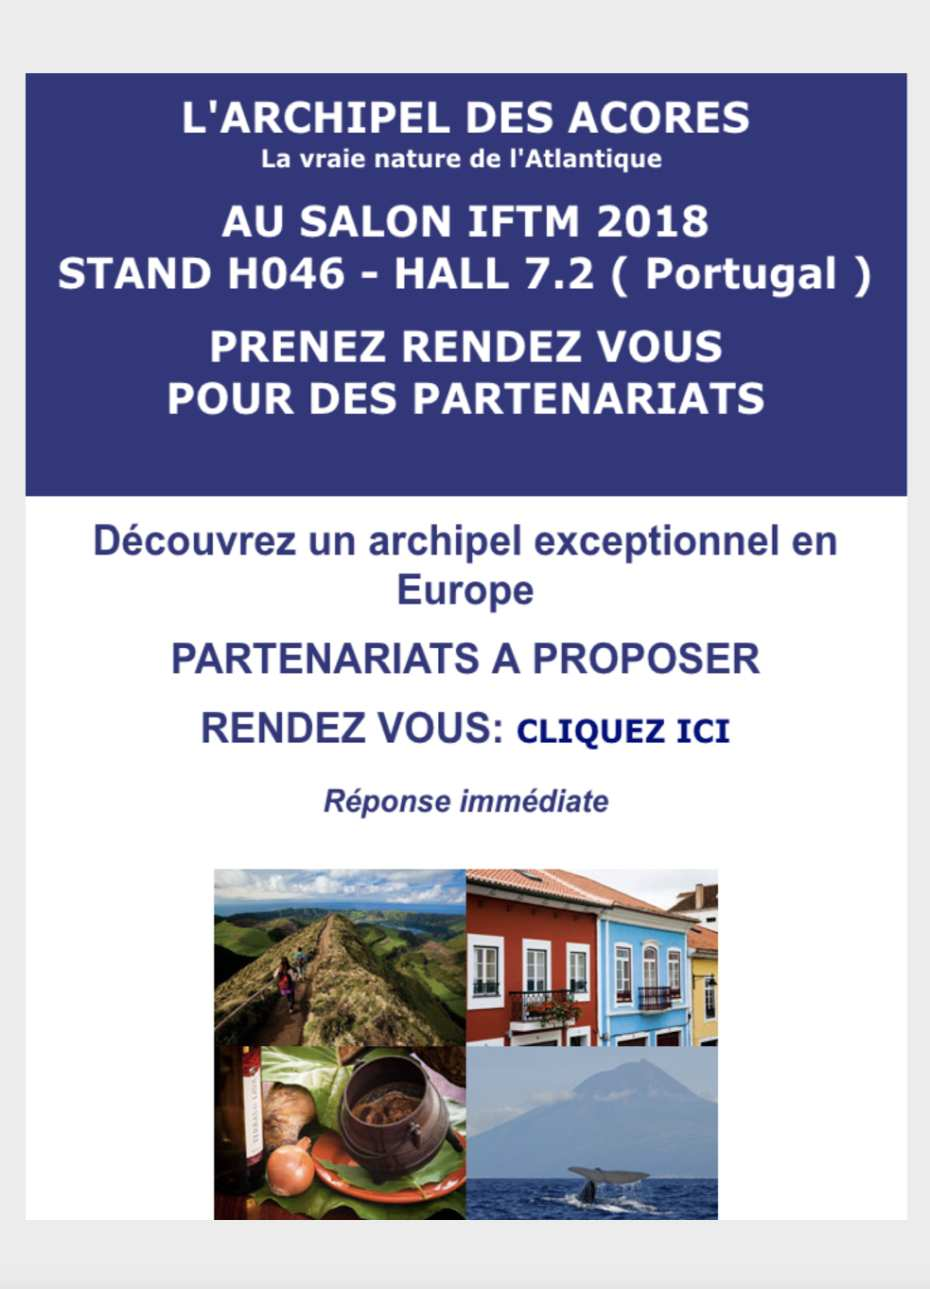 acores-mailing-zone-web-promotion-iftm-18